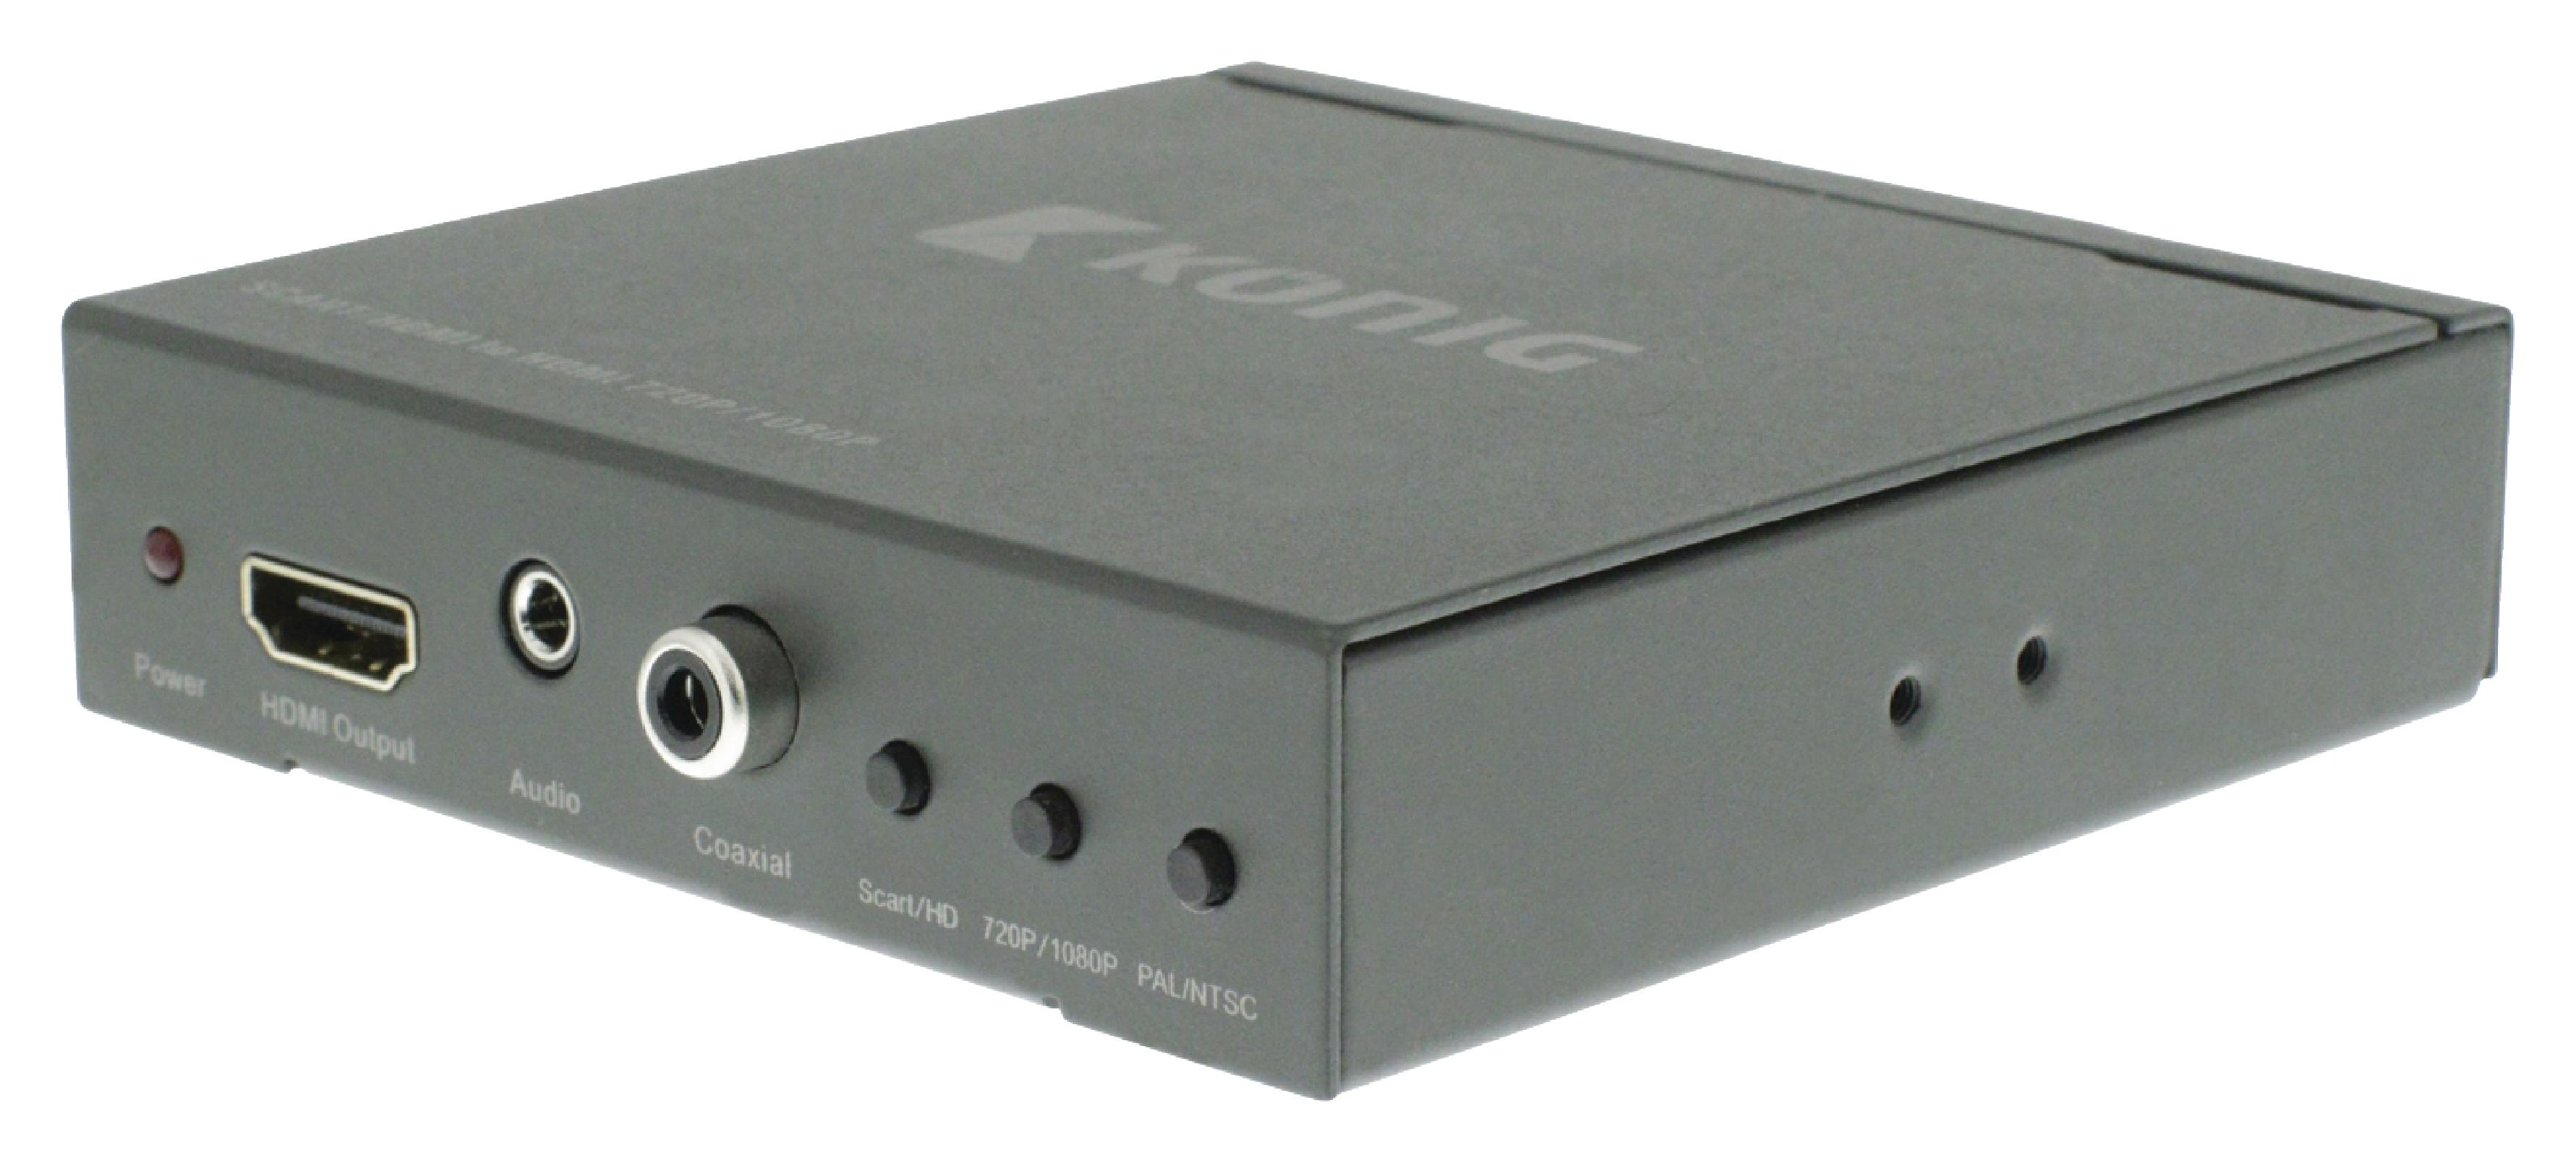 HDMI převodník SCART na HDMI, Full HD 1920x1080